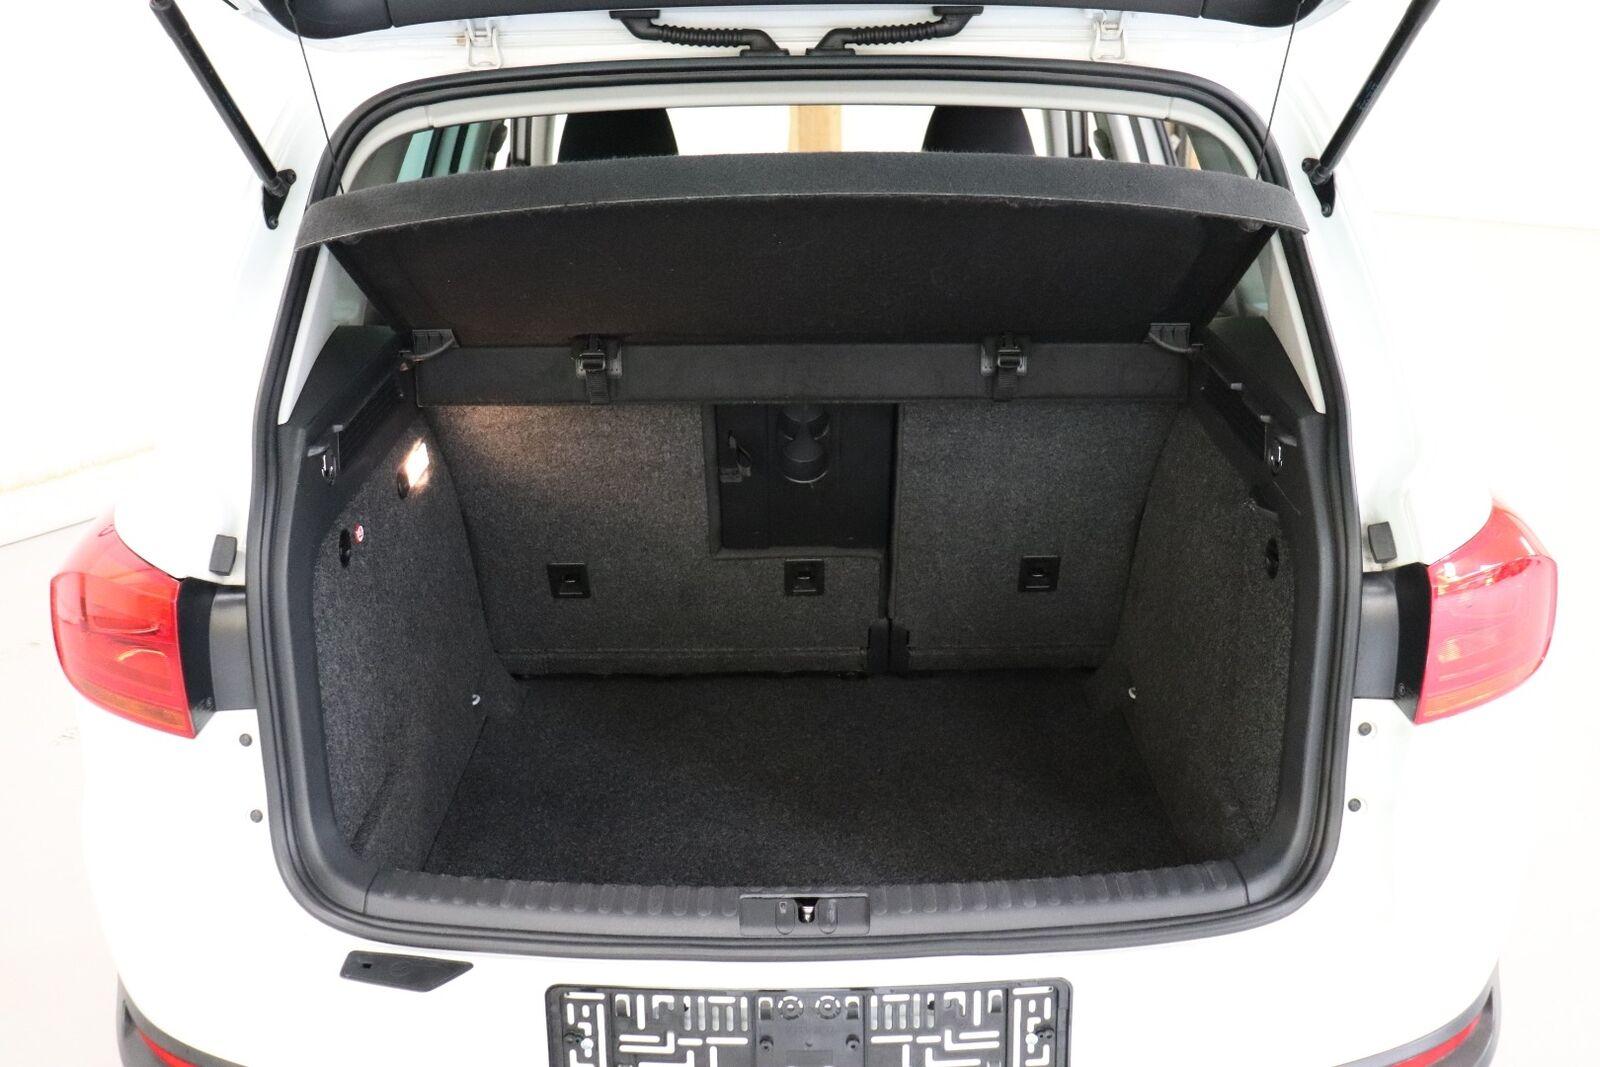 VW Tiguan 2,0 TDi 177 Sport & Style DSG 4Motion